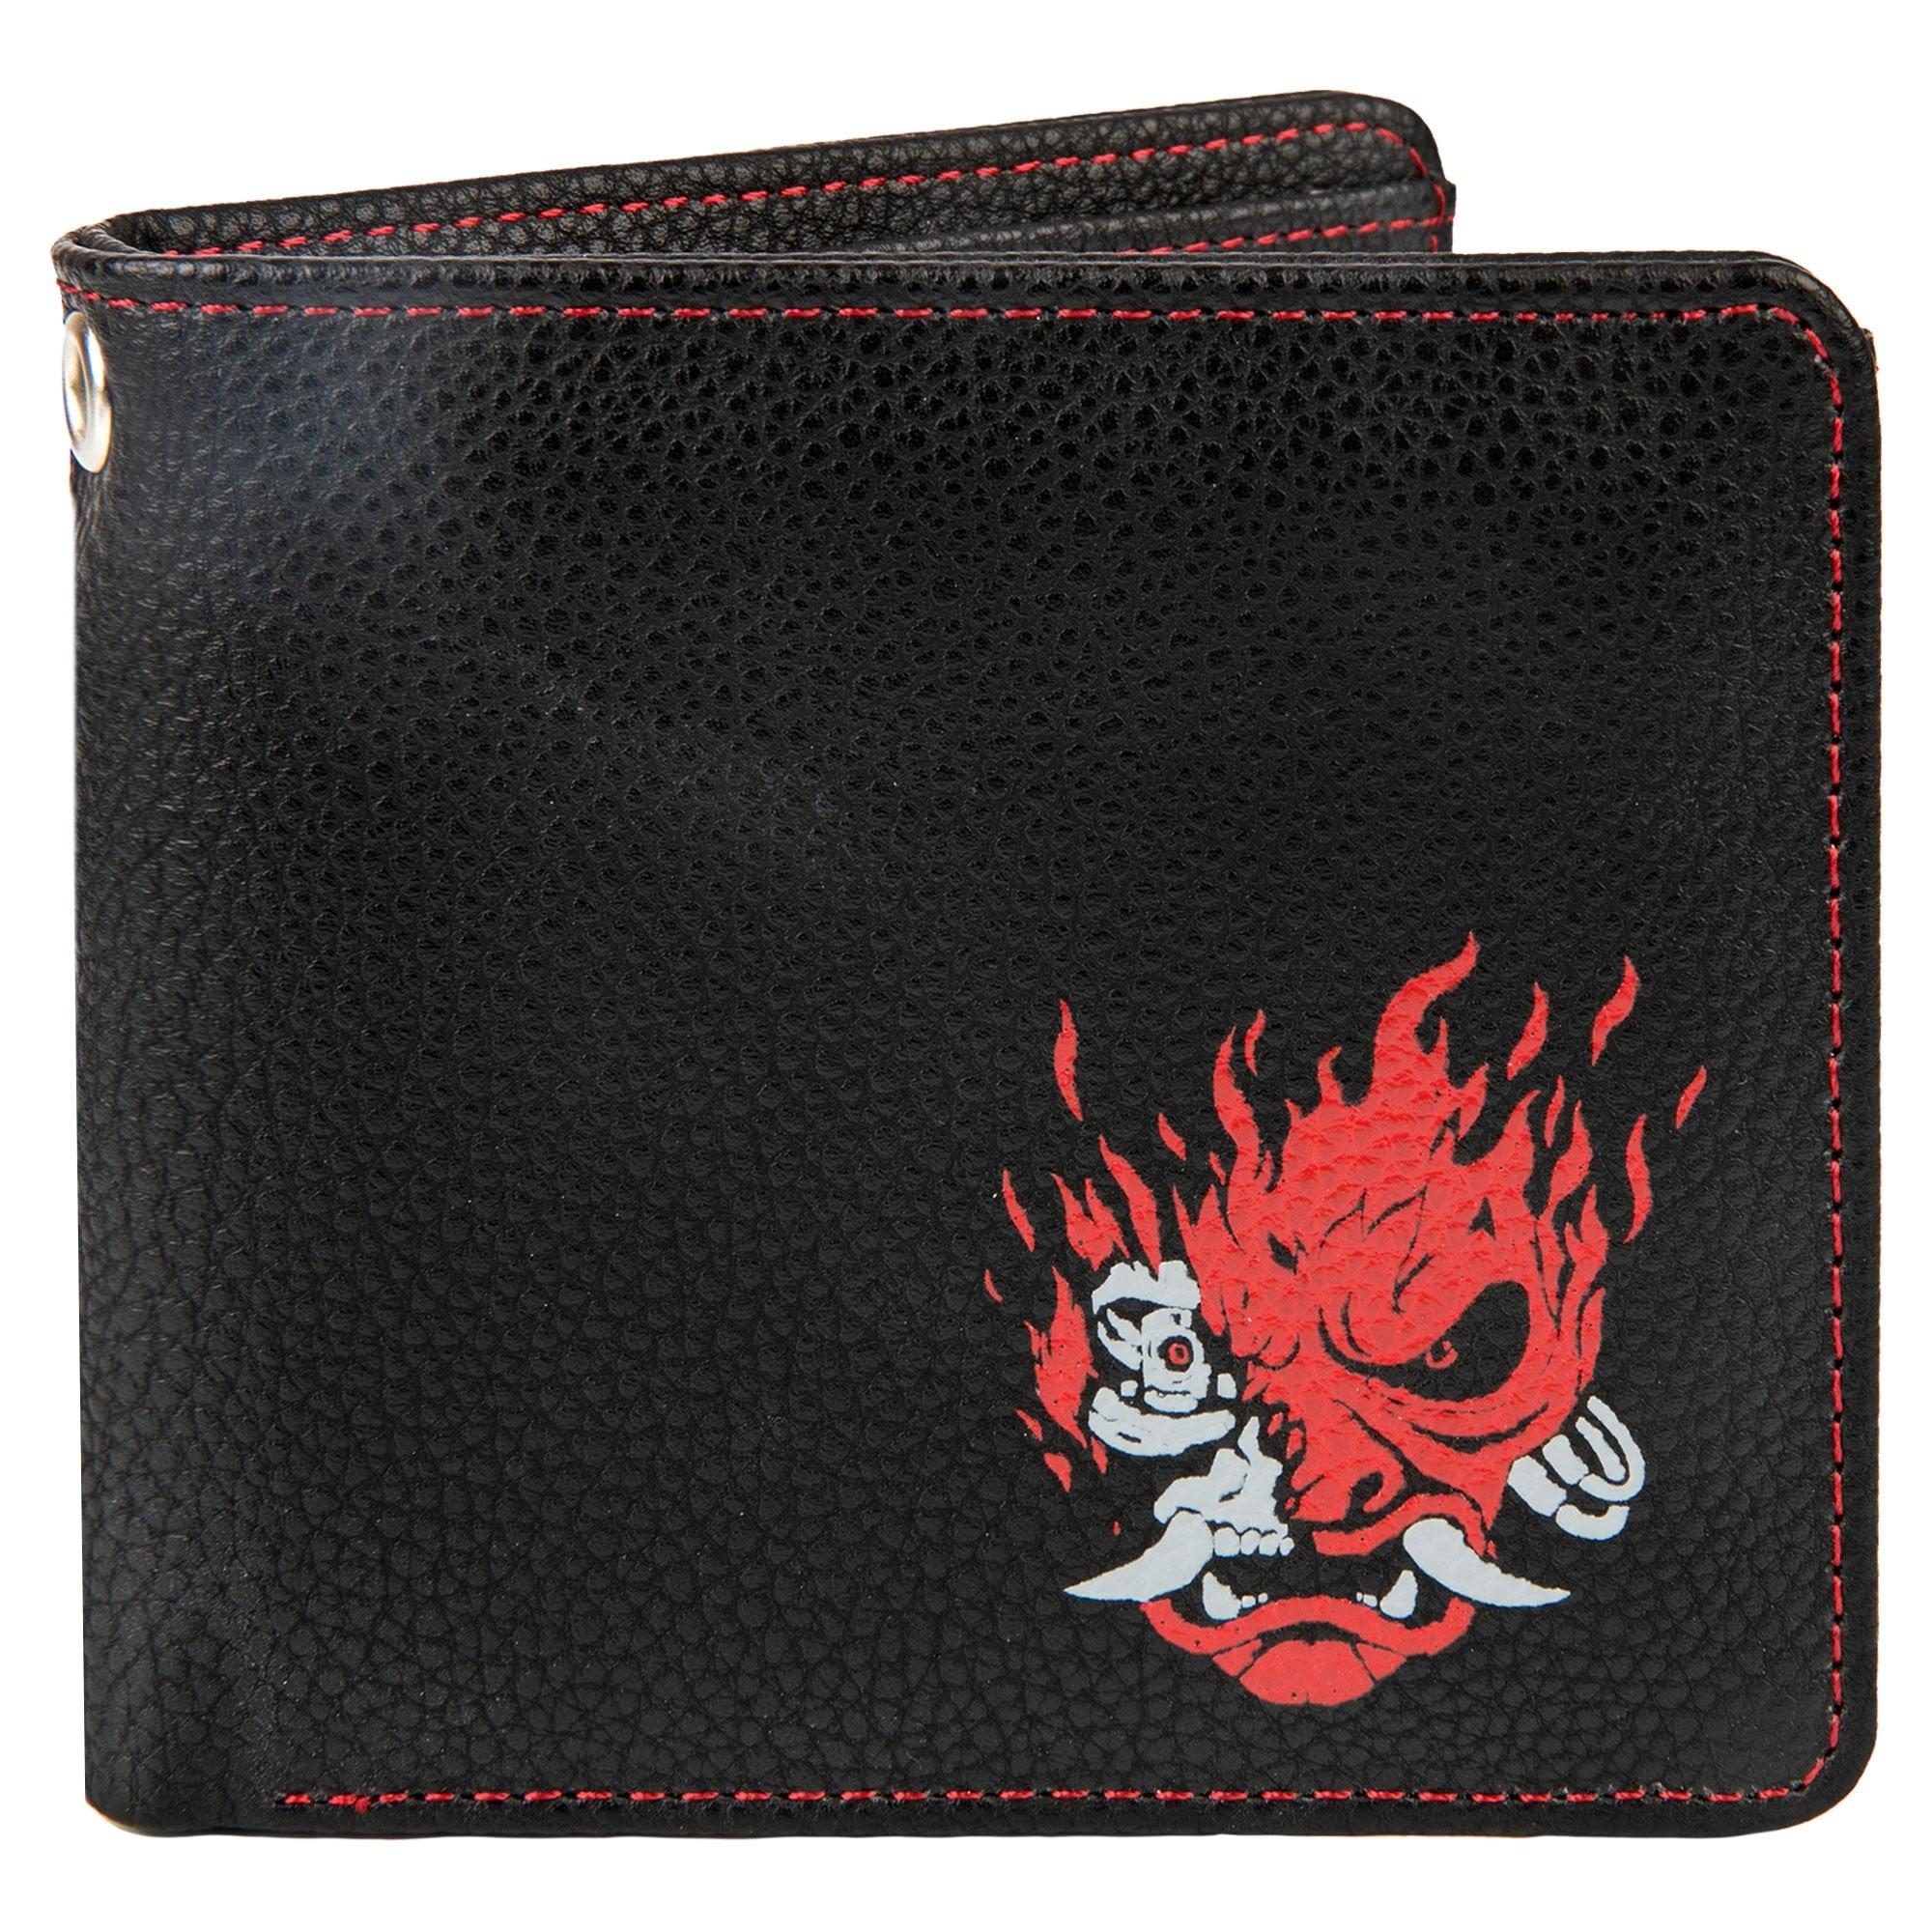 Cyberpunk 2077 Night Samurai BI-Fold Wallet Black/Red